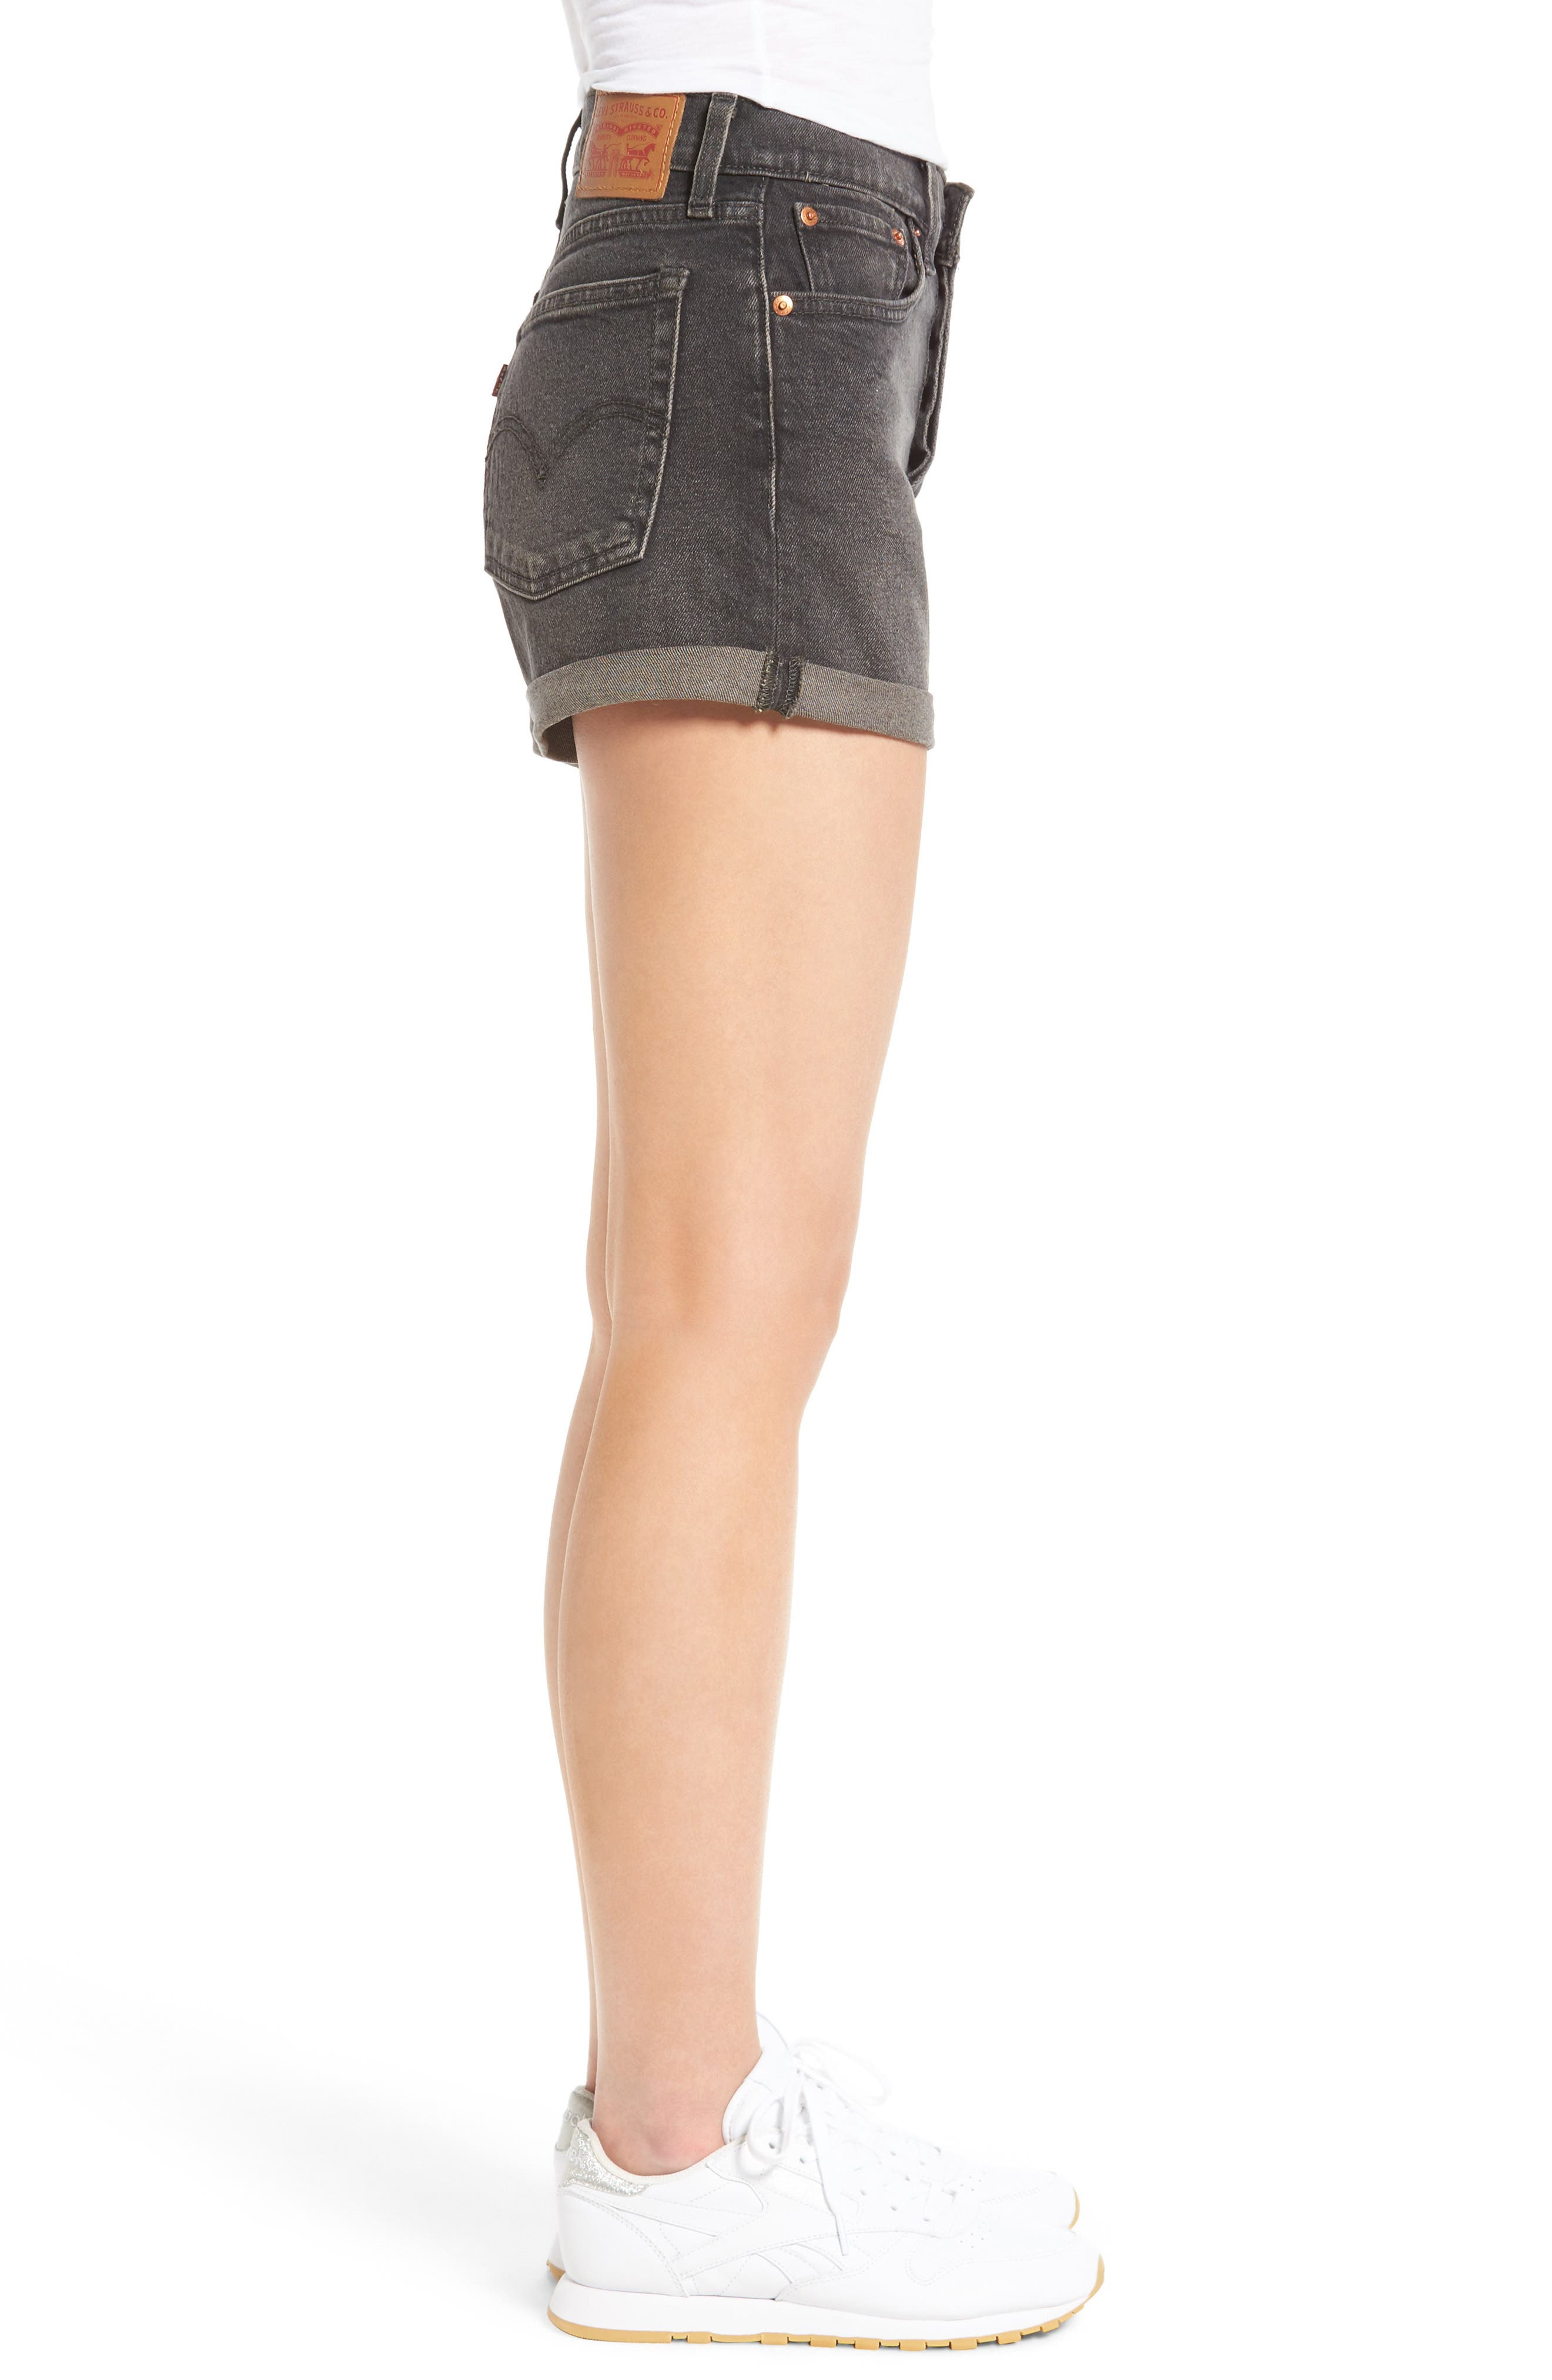 Wedgie High Waist Denim Shorts,                             Alternate thumbnail 3, color,                             001